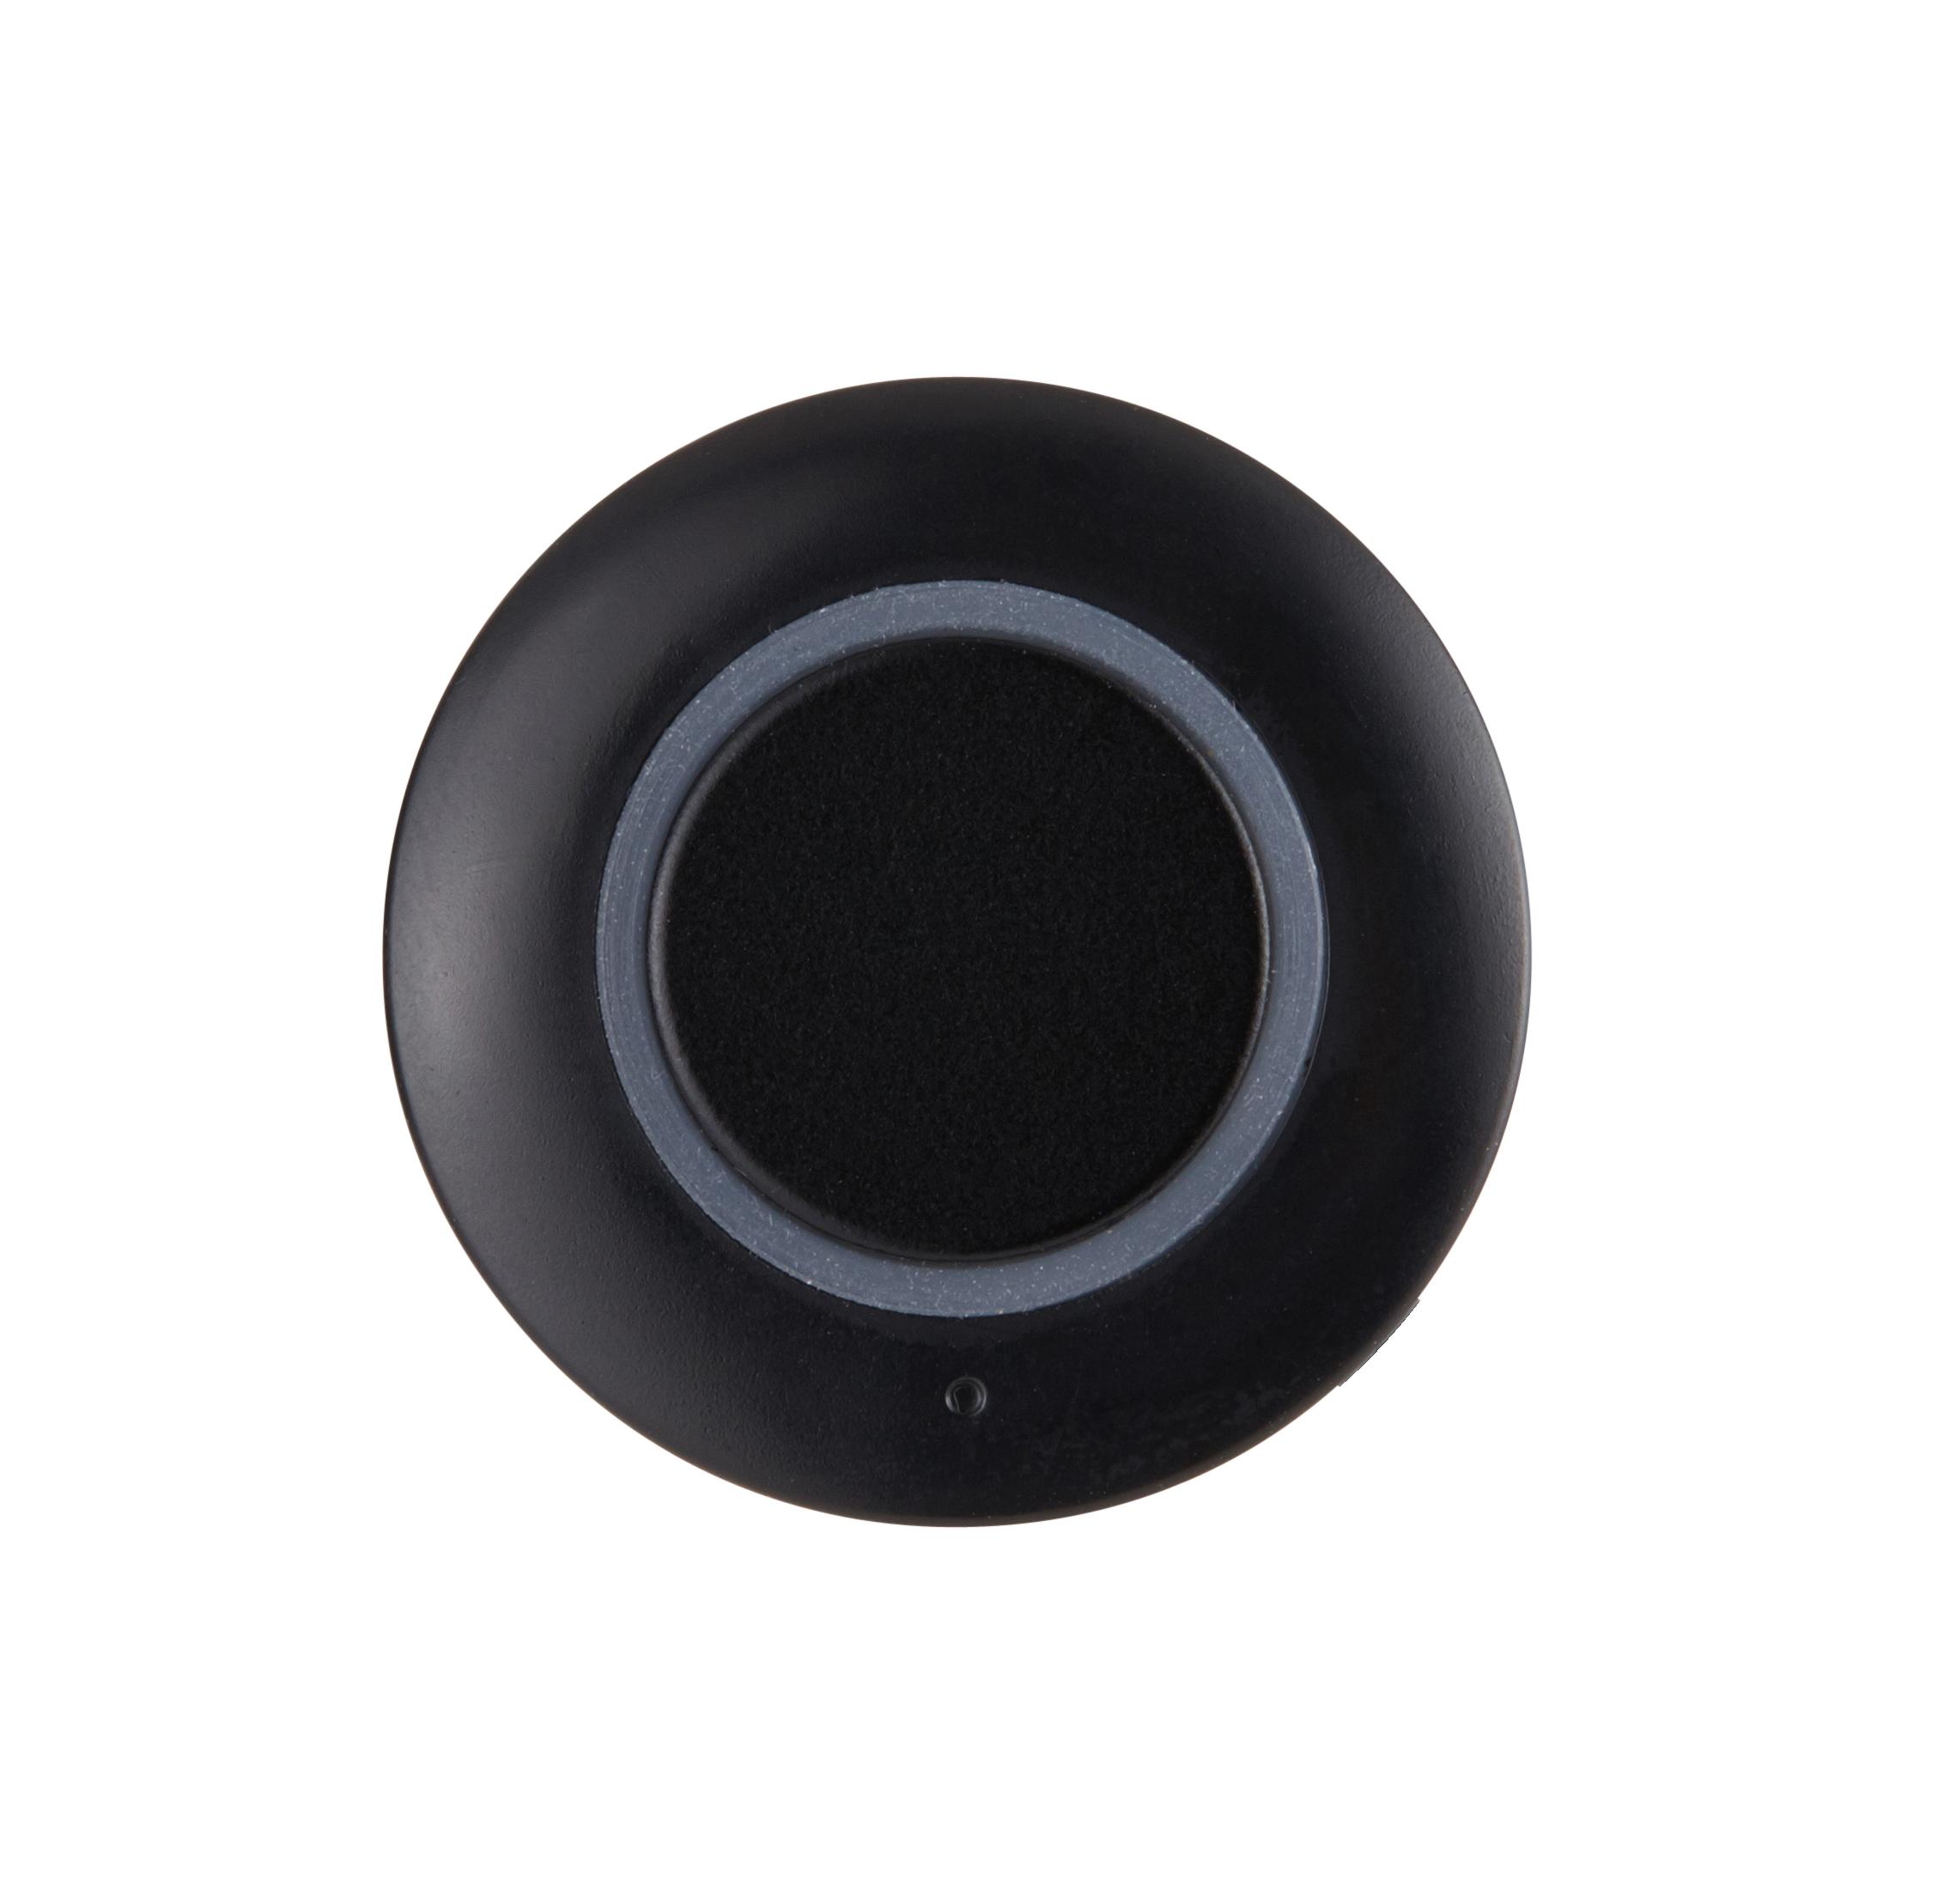 MATTE BLACK Echomaster PS-RBP-M PARKALERT DIGITAL REAR SENSING SYSTEM